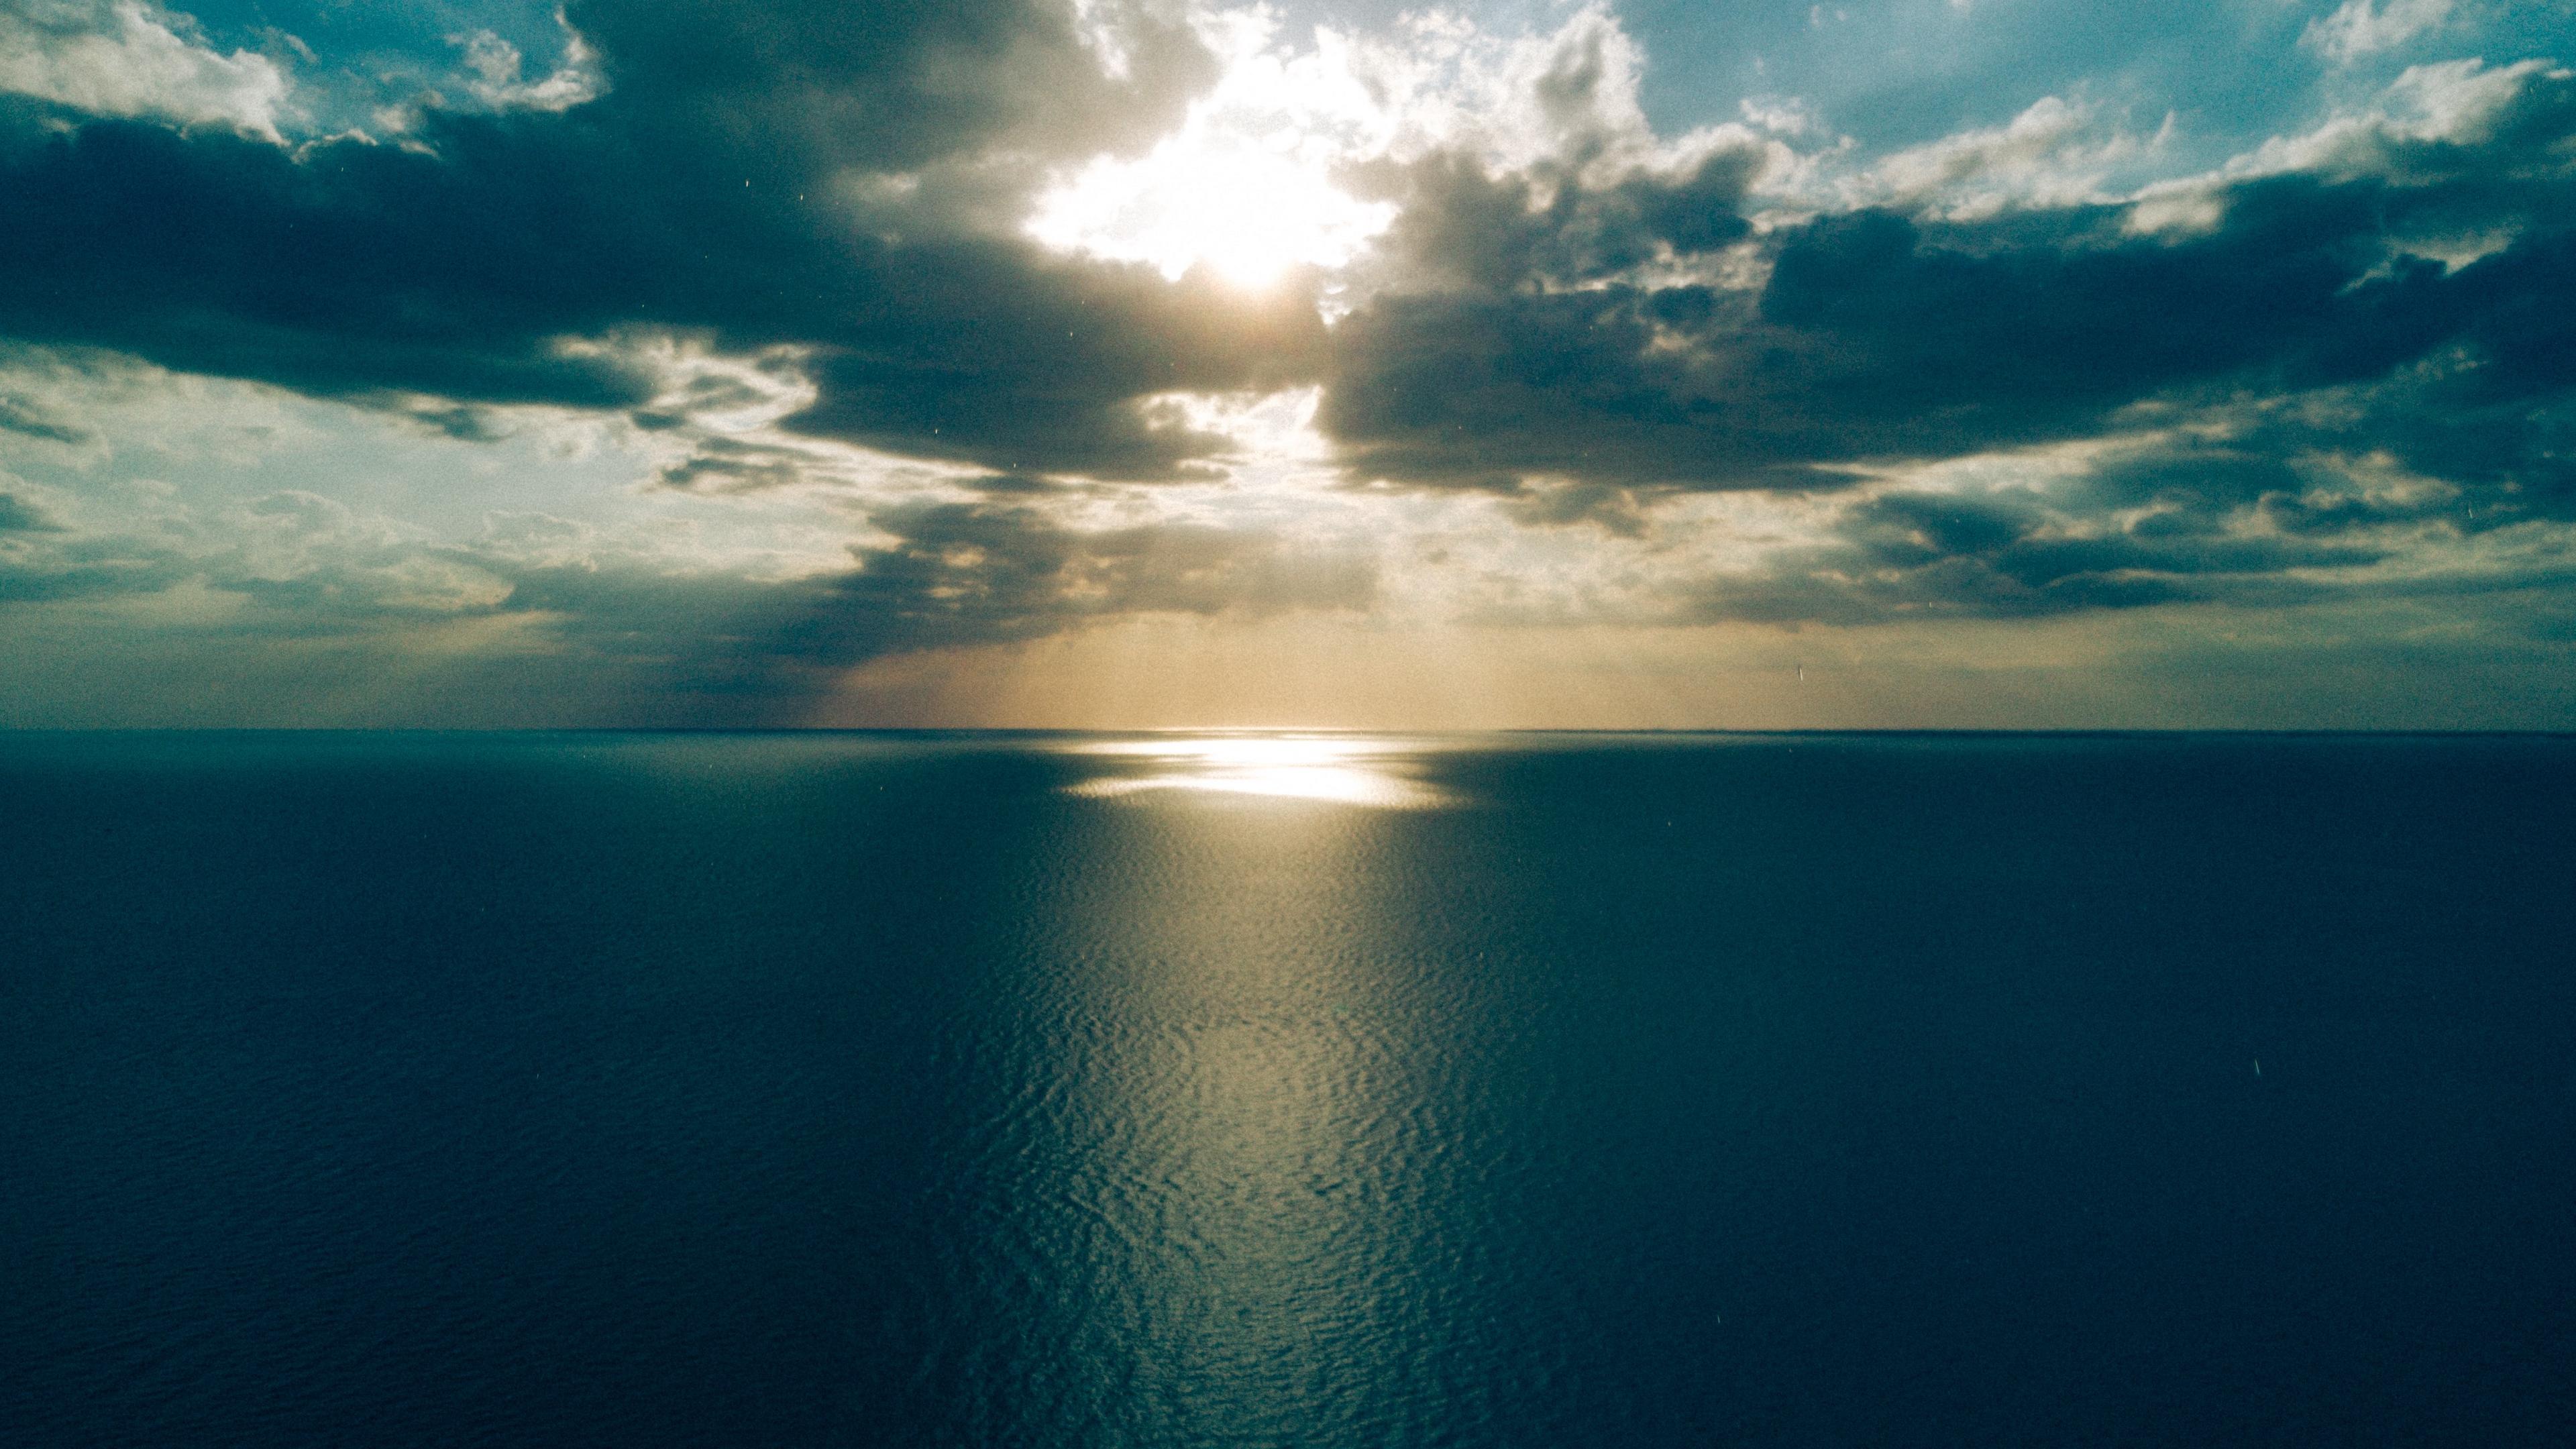 sea clouds horizon light sun sunset 4k 1541117829 - sea, clouds, horizon, light, sun, sunset 4k - Sea, Horizon, Clouds